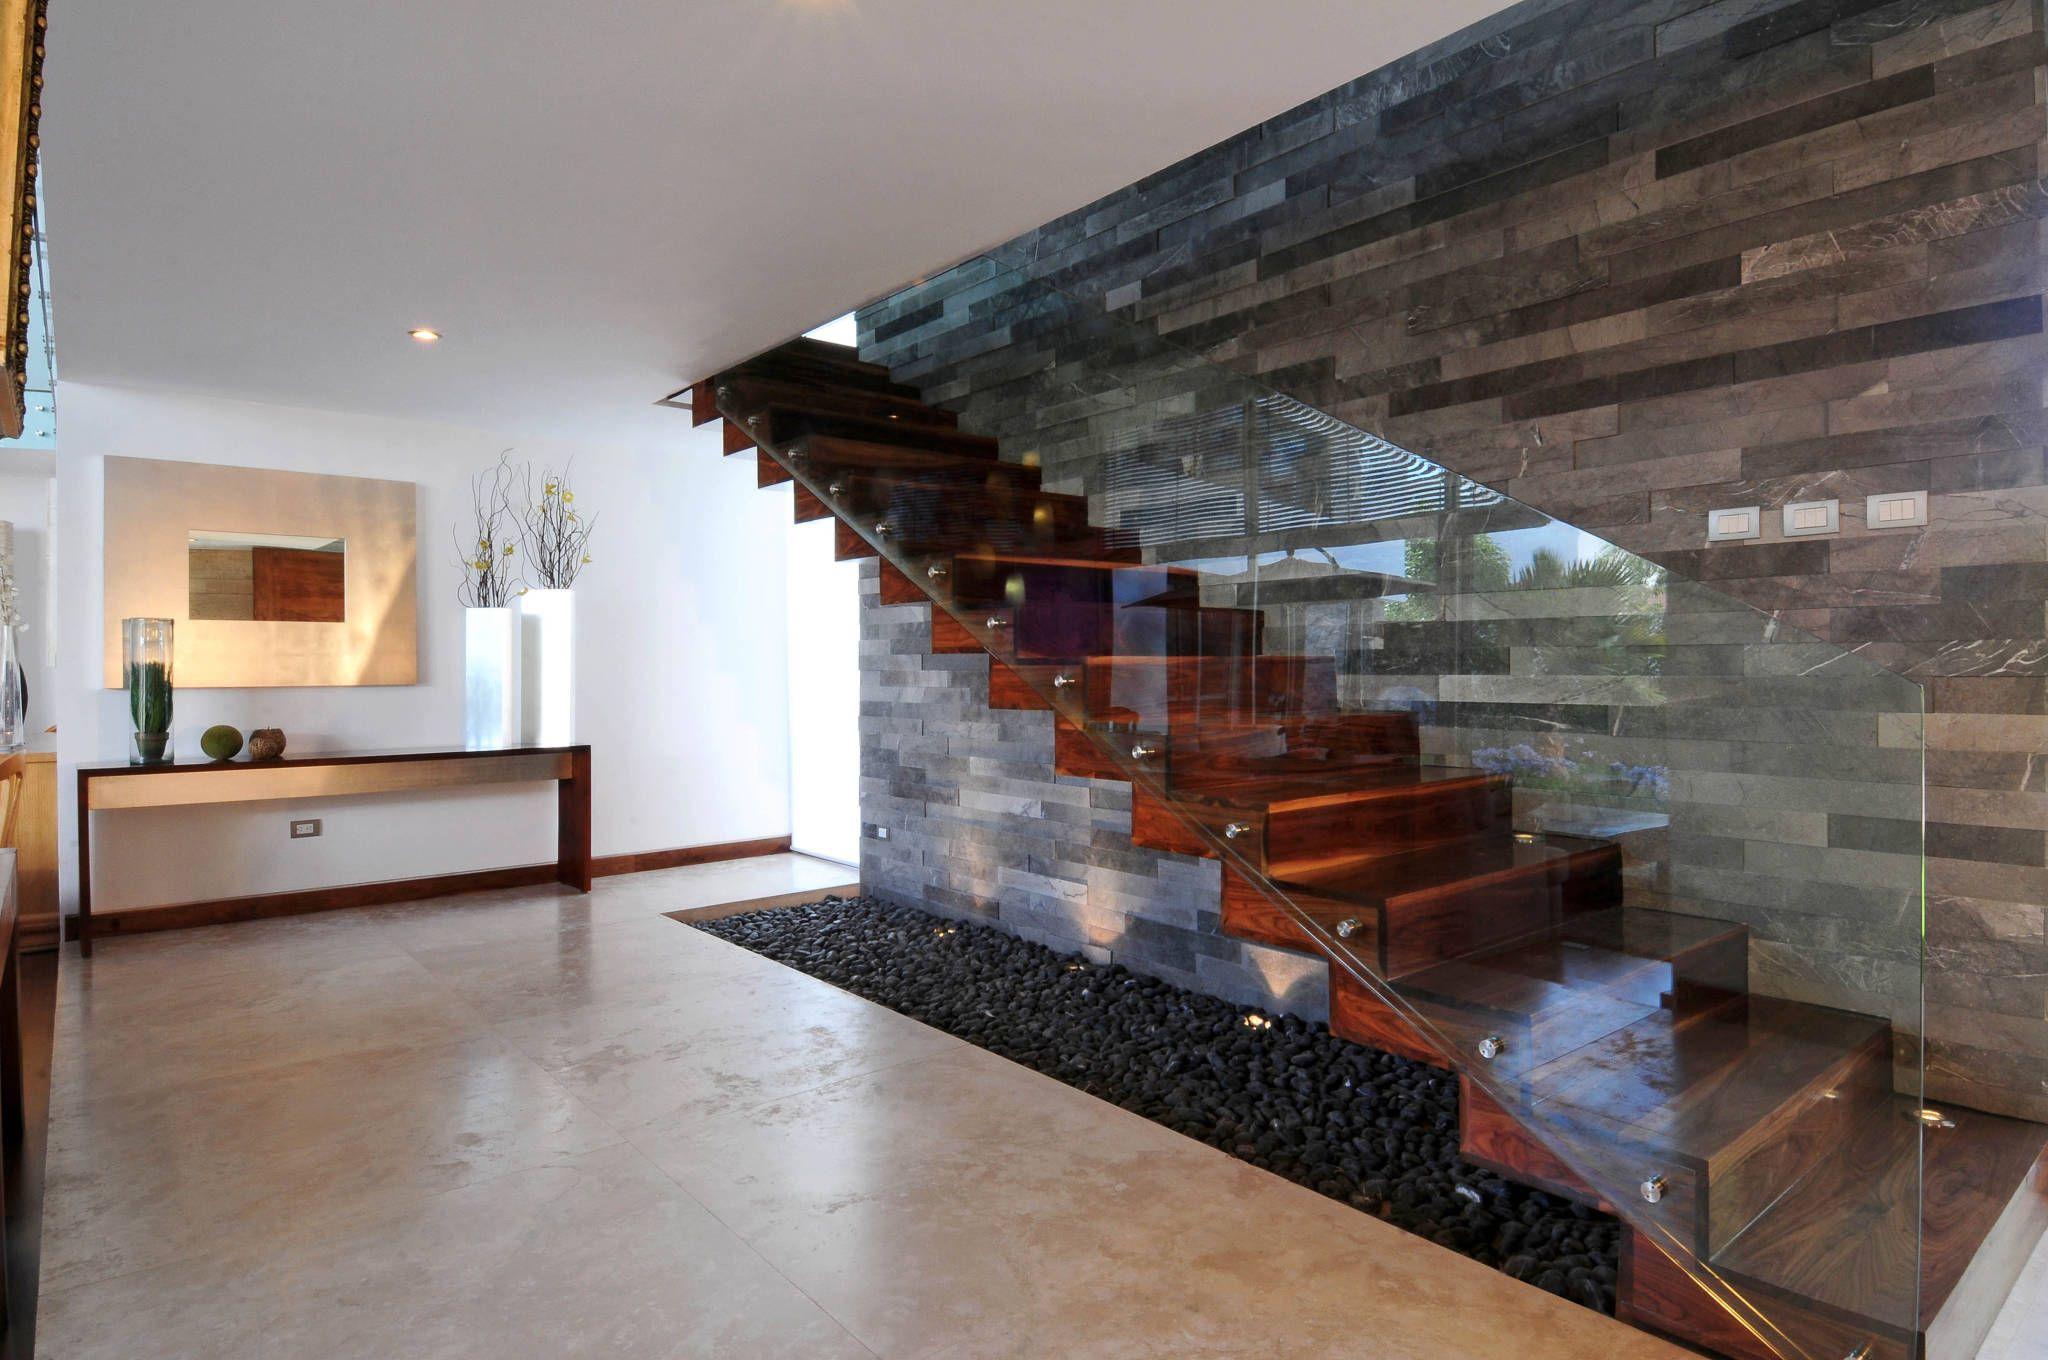 Pasillos y recibidores de estilo por ze houses ideas for Arquitectura y diseno de casas modernas